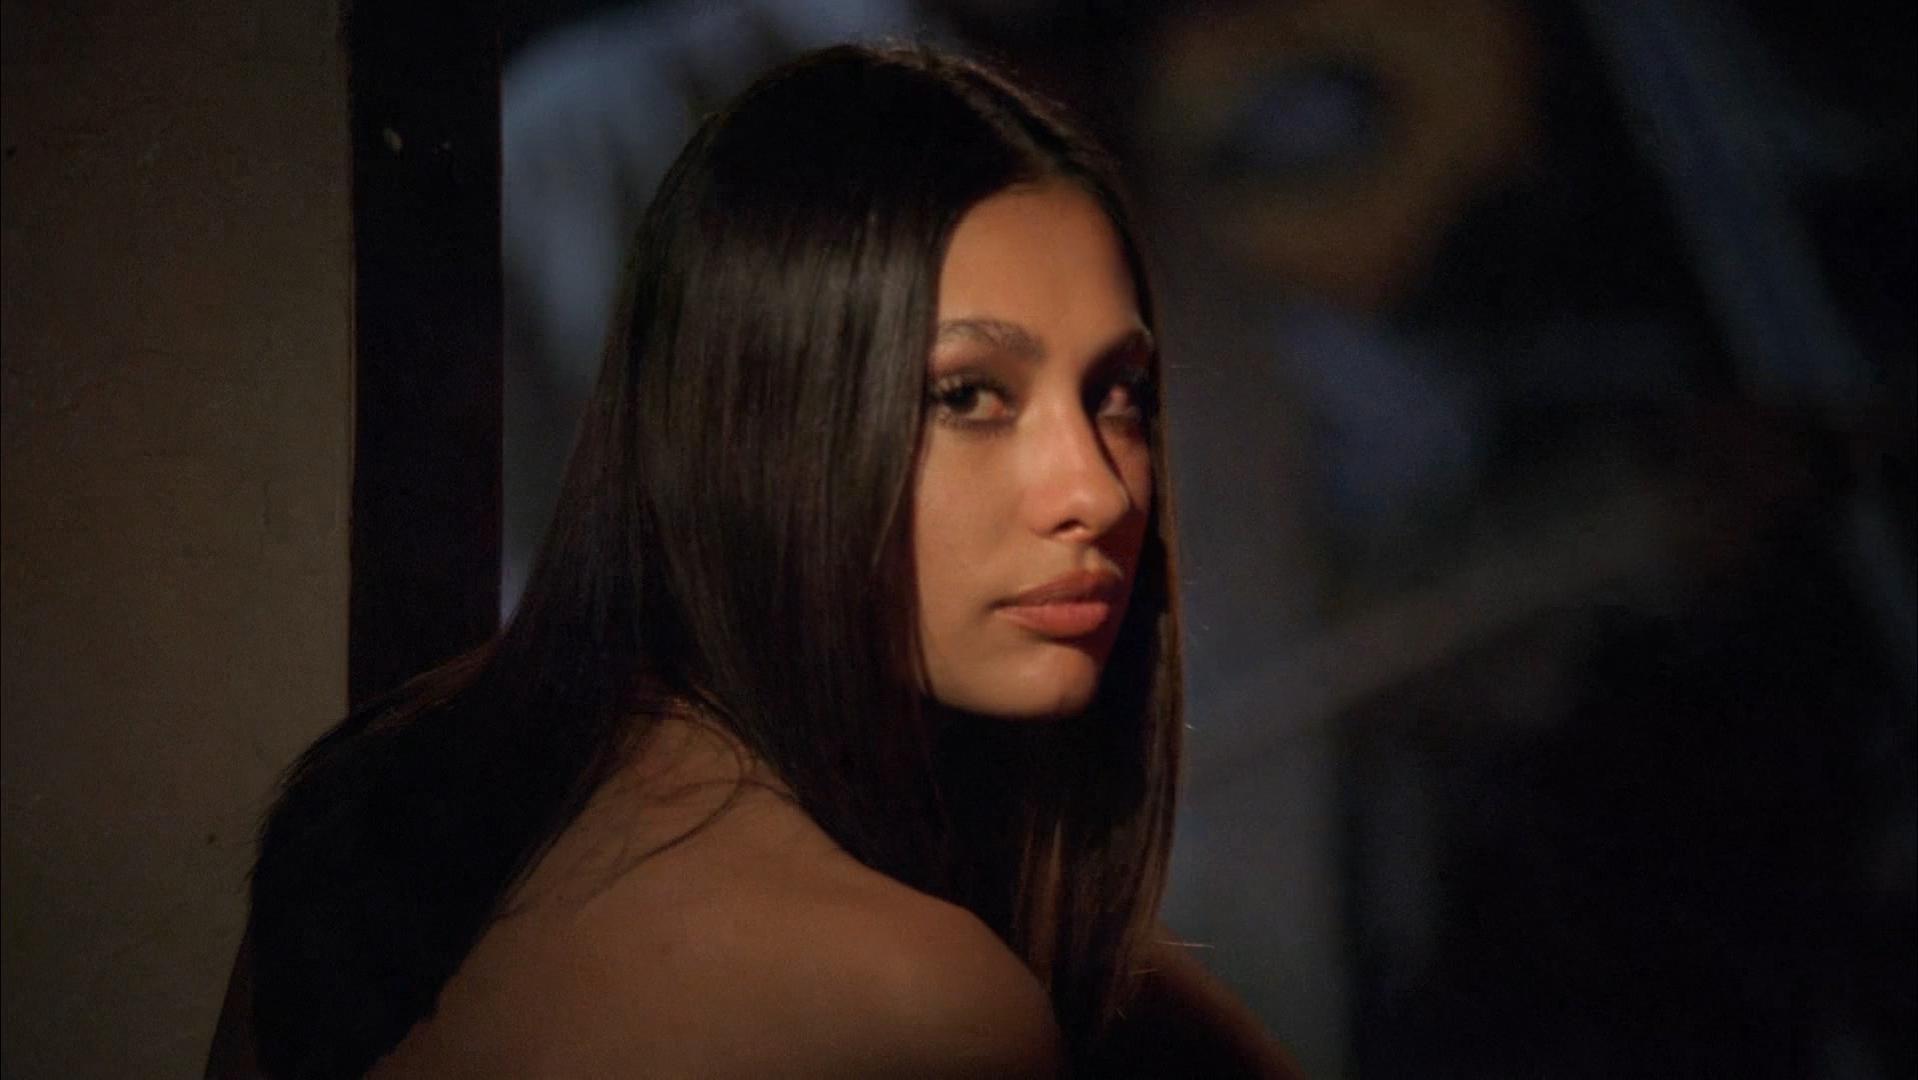 Jasmina nackt Hdagha Jasmina Hdagha